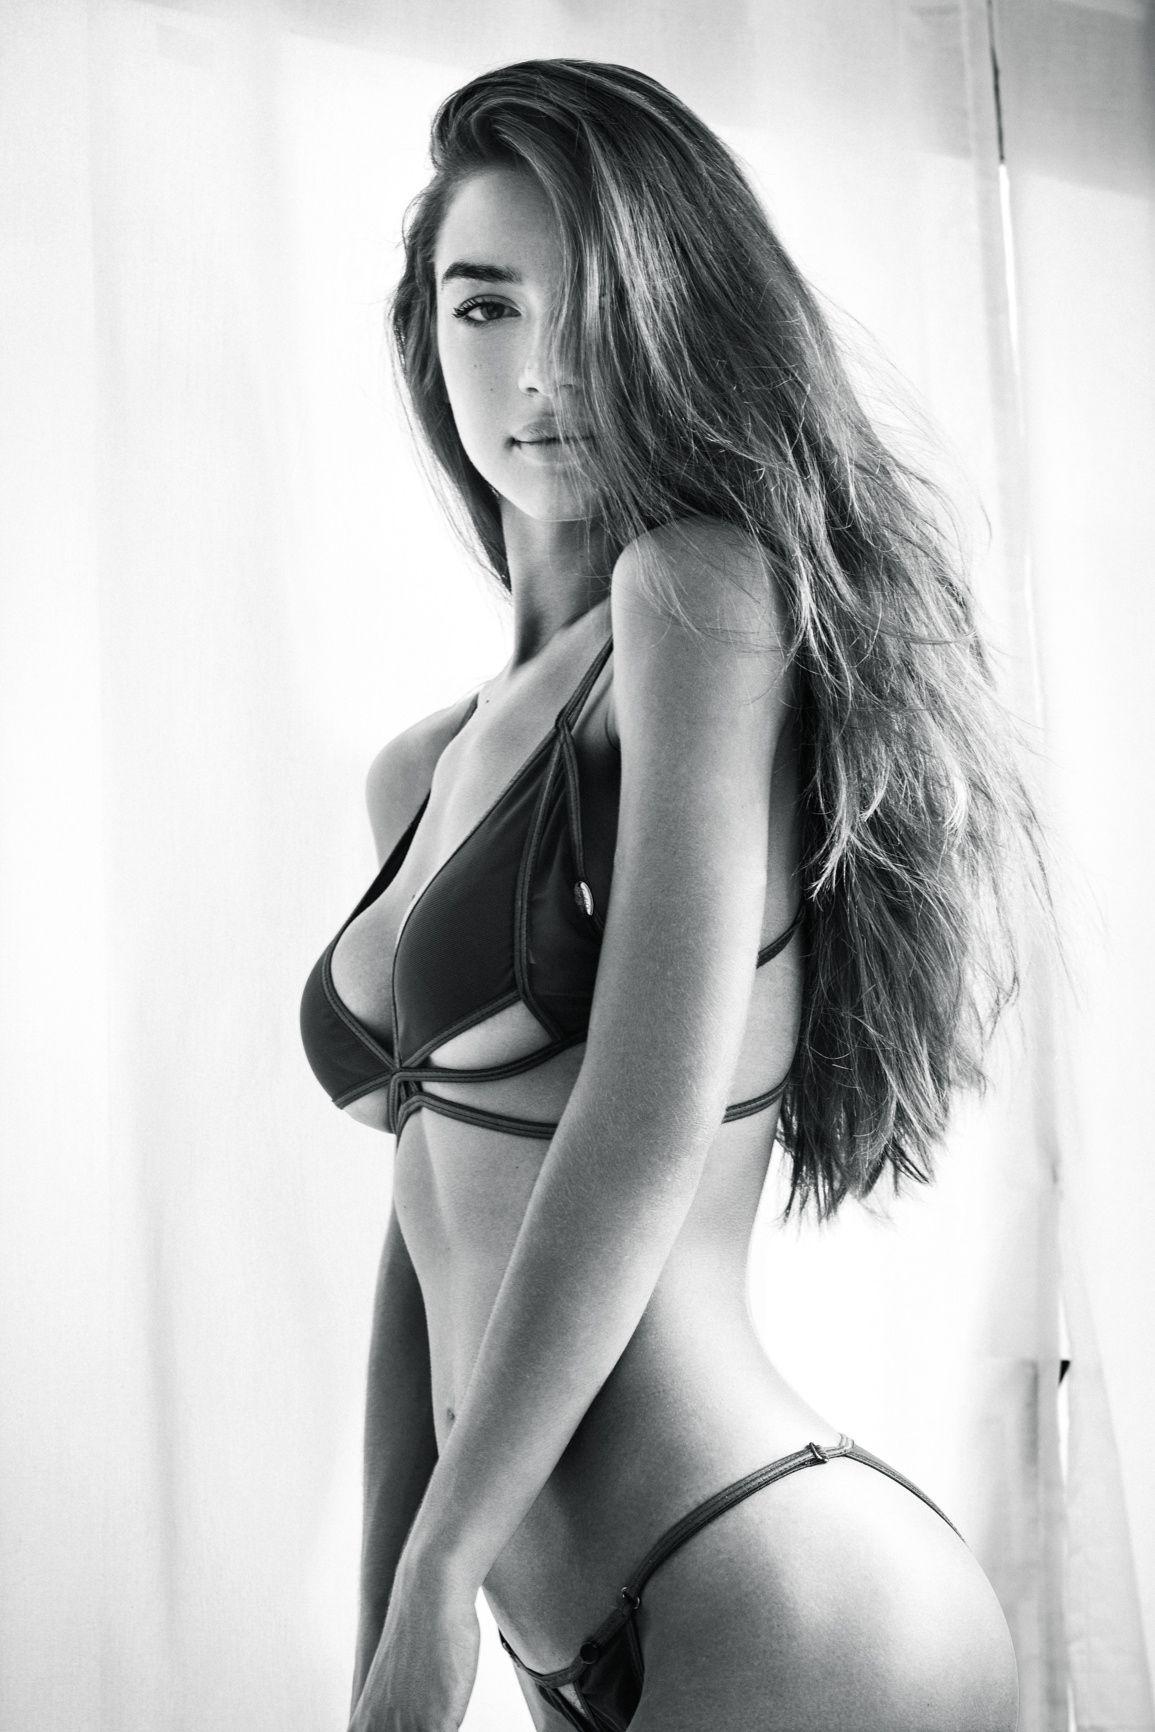 Instagram Valeriya Volkova nudes (79 photos), Sexy, Is a cute, Feet, lingerie 2018